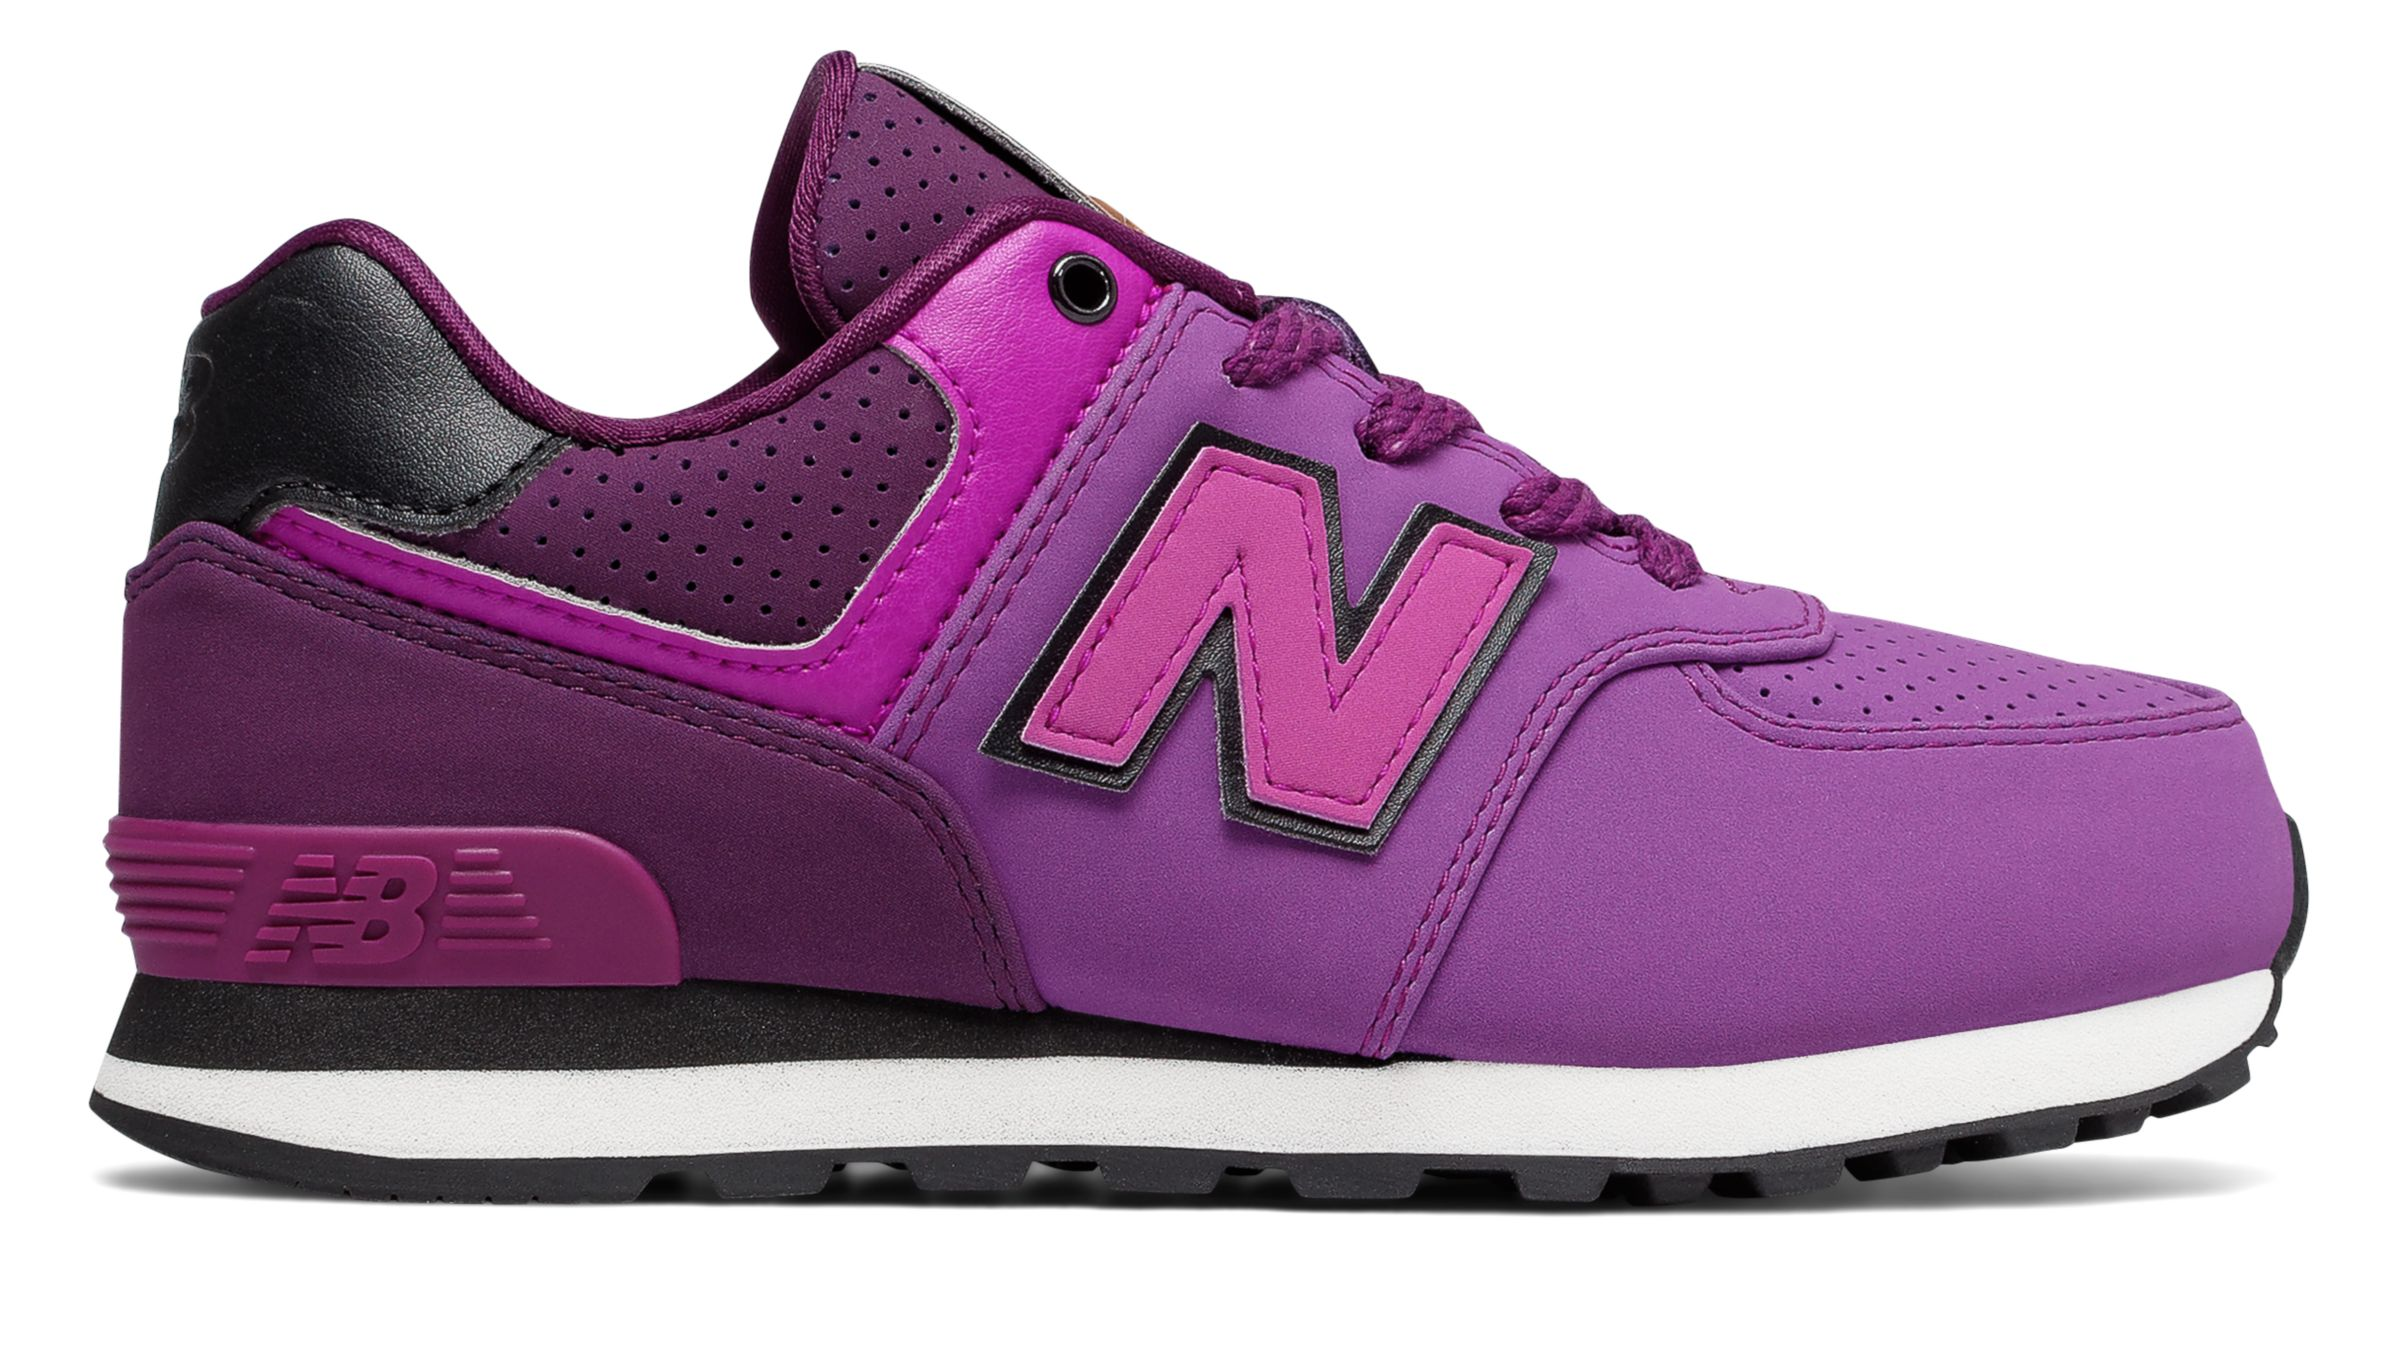 NB 574 New Balance, Purple with Black